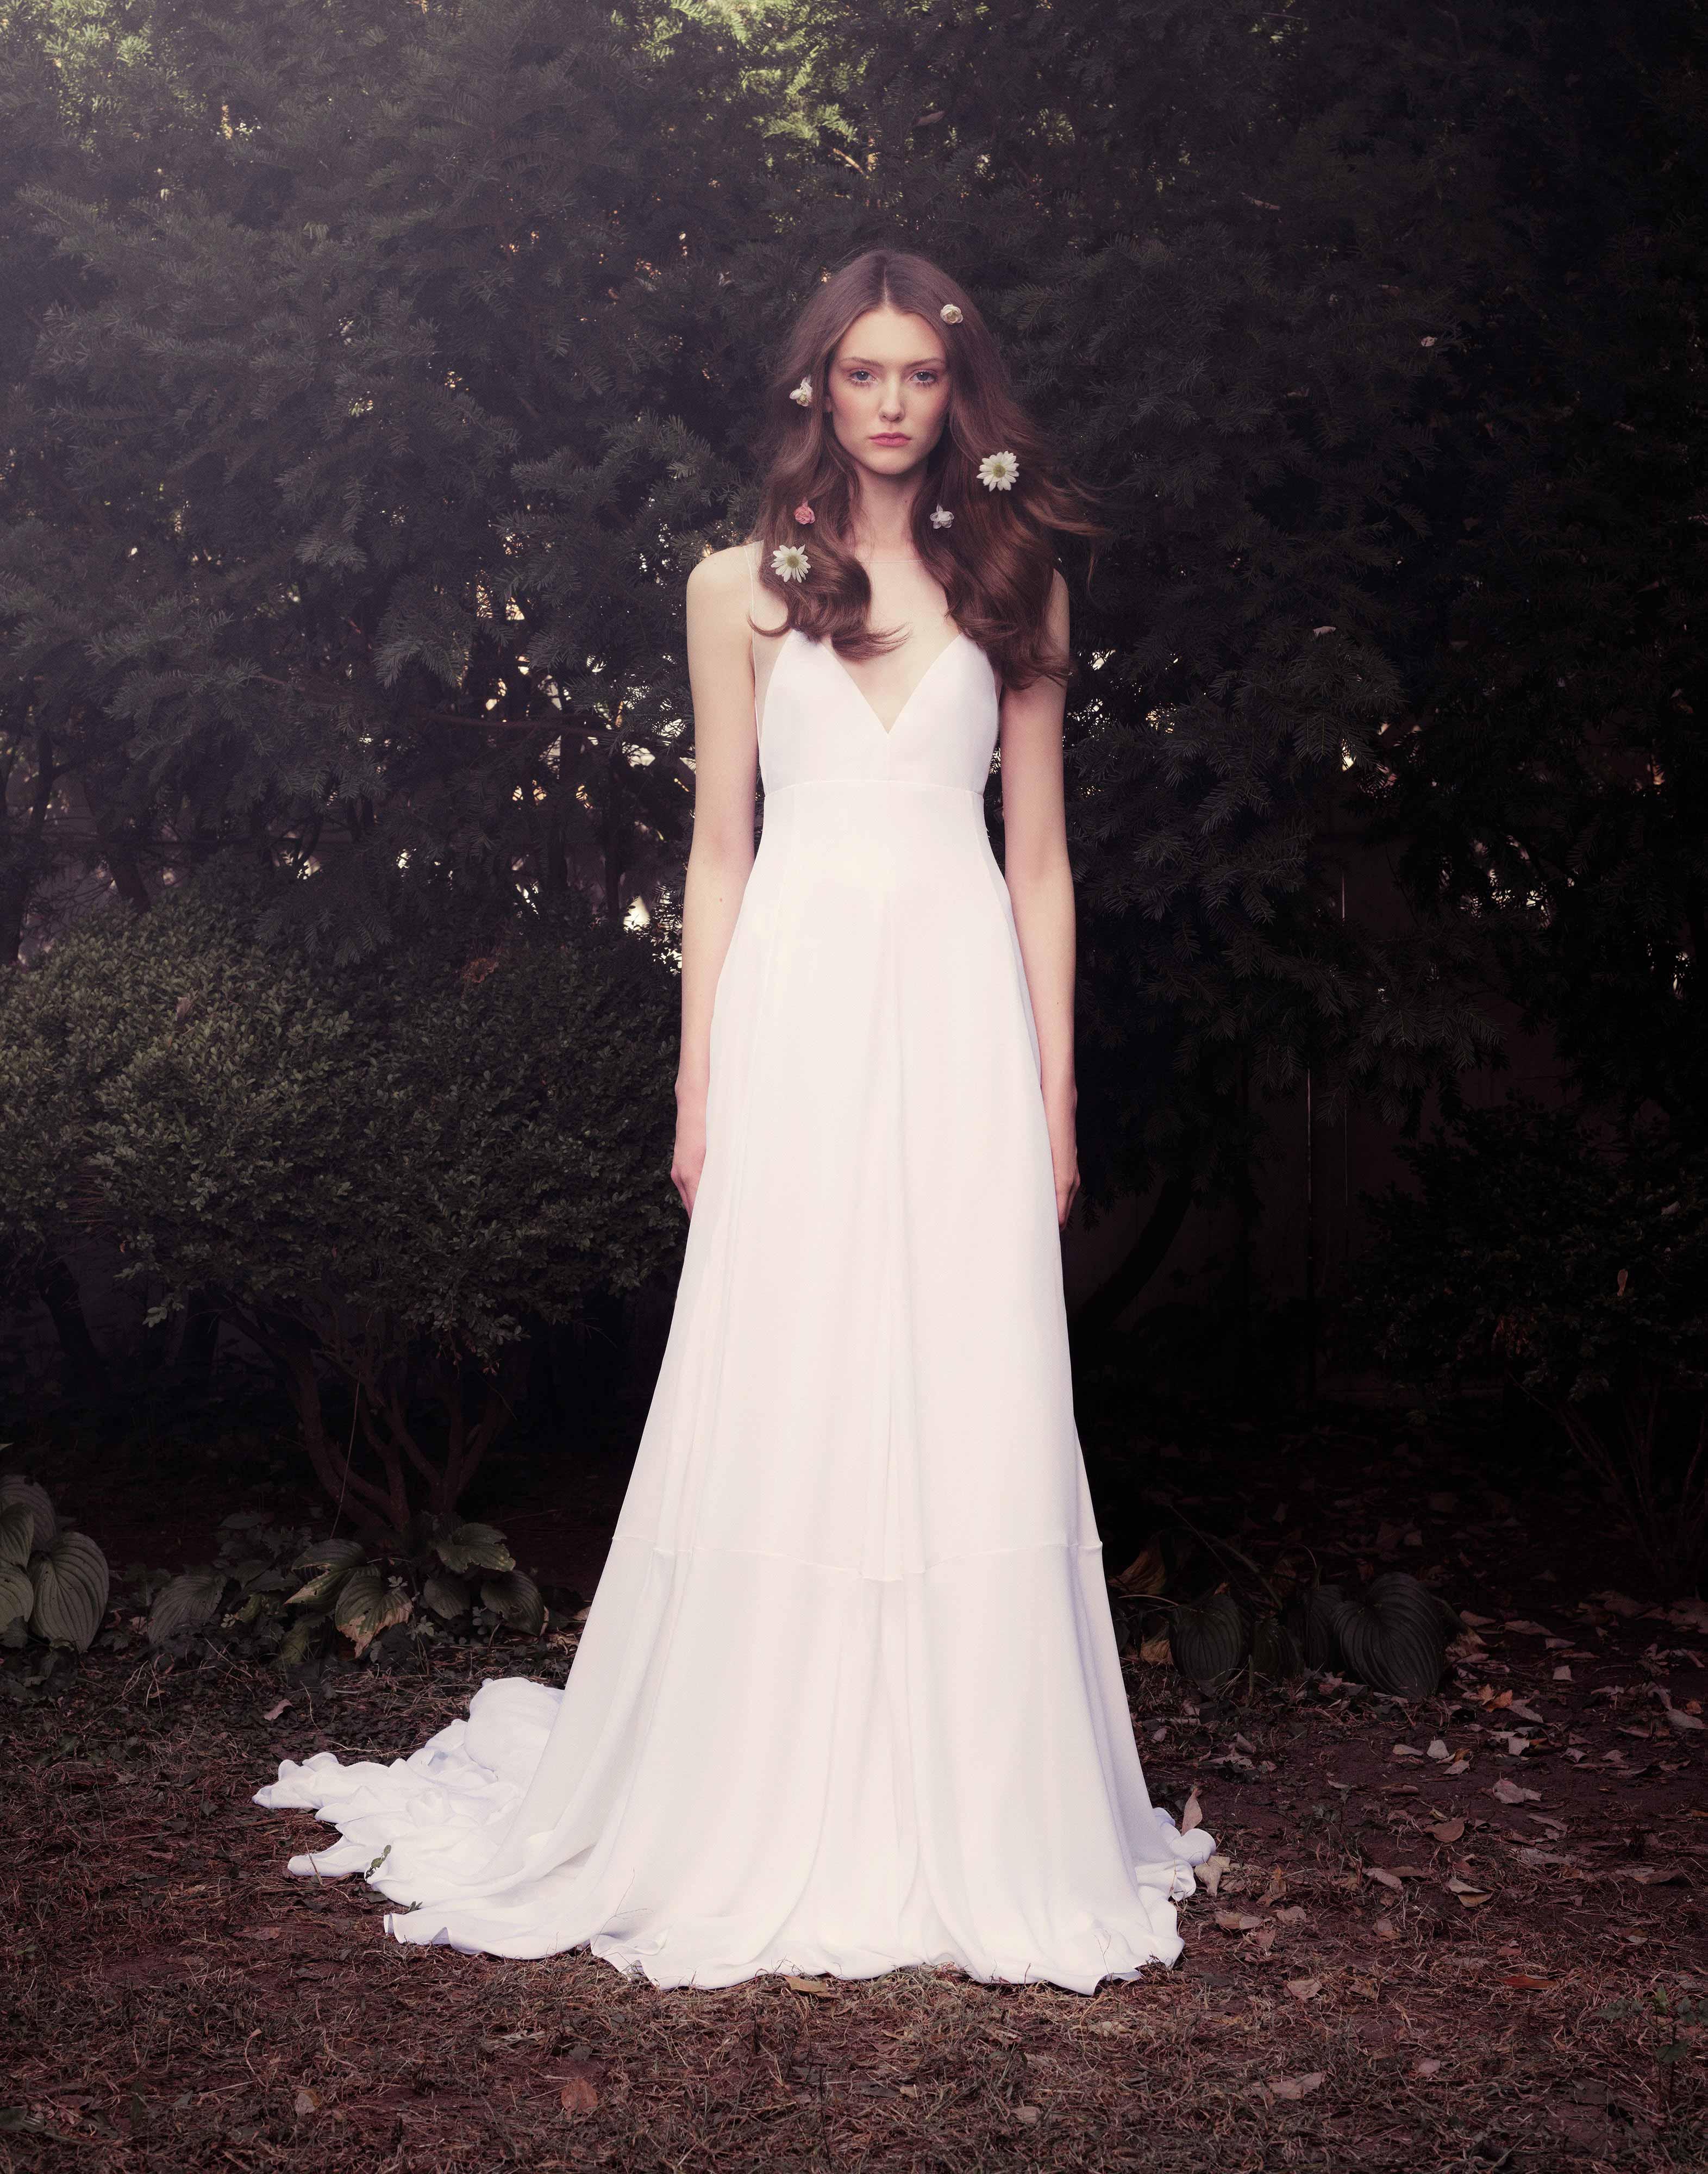 honor fall 2018 v-neck wedding dress